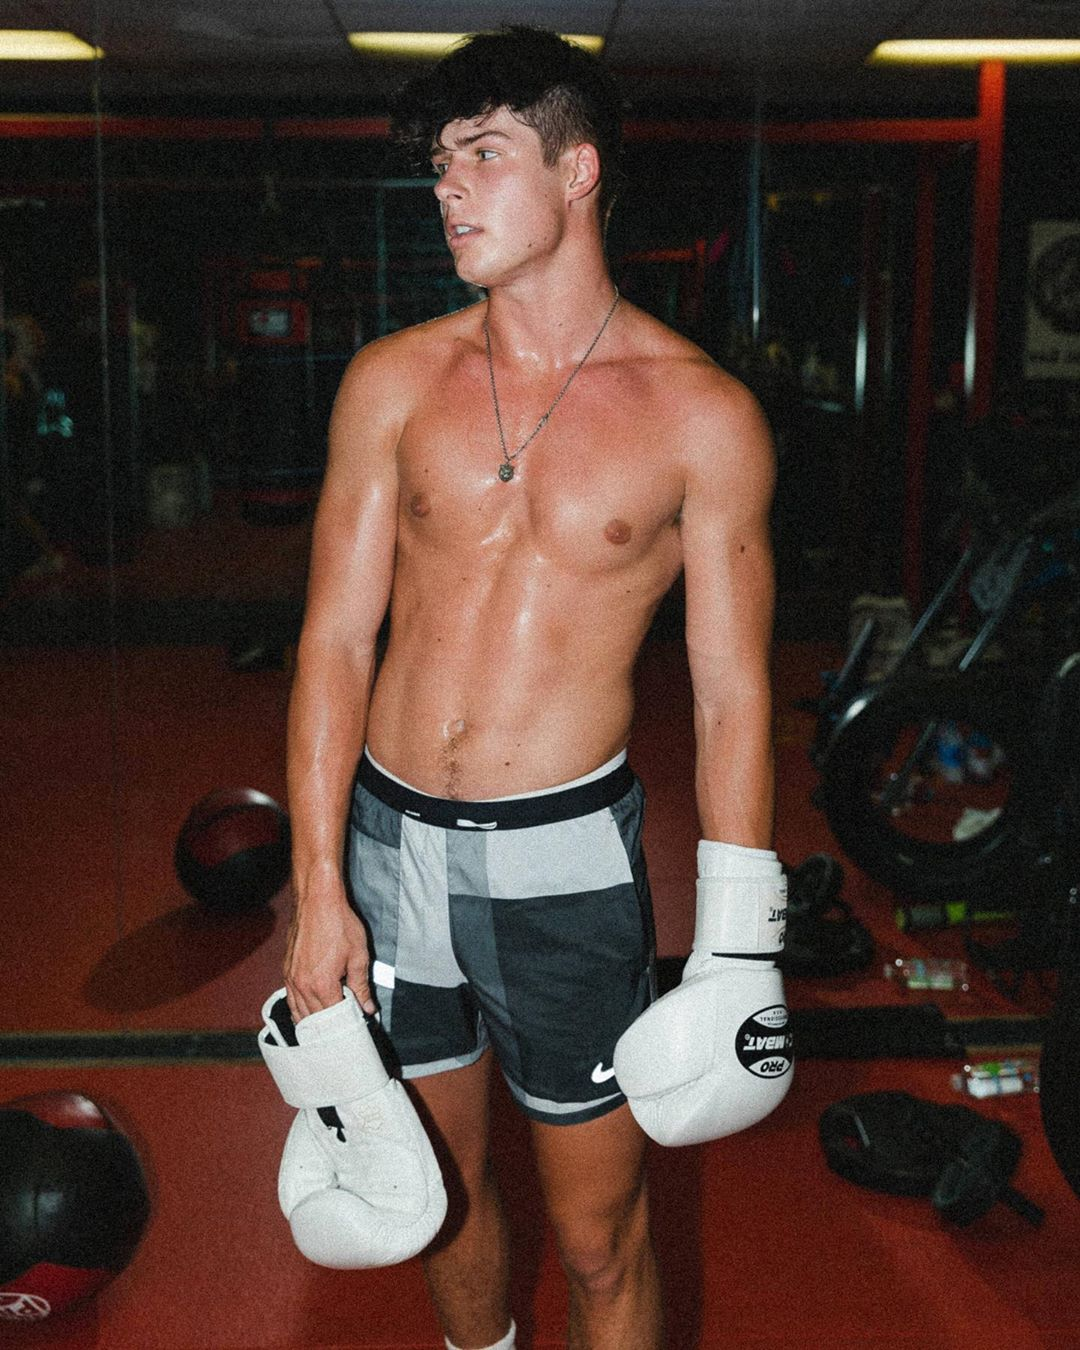 Блейк Грей (Blake Gray): биография блогера из TikTok